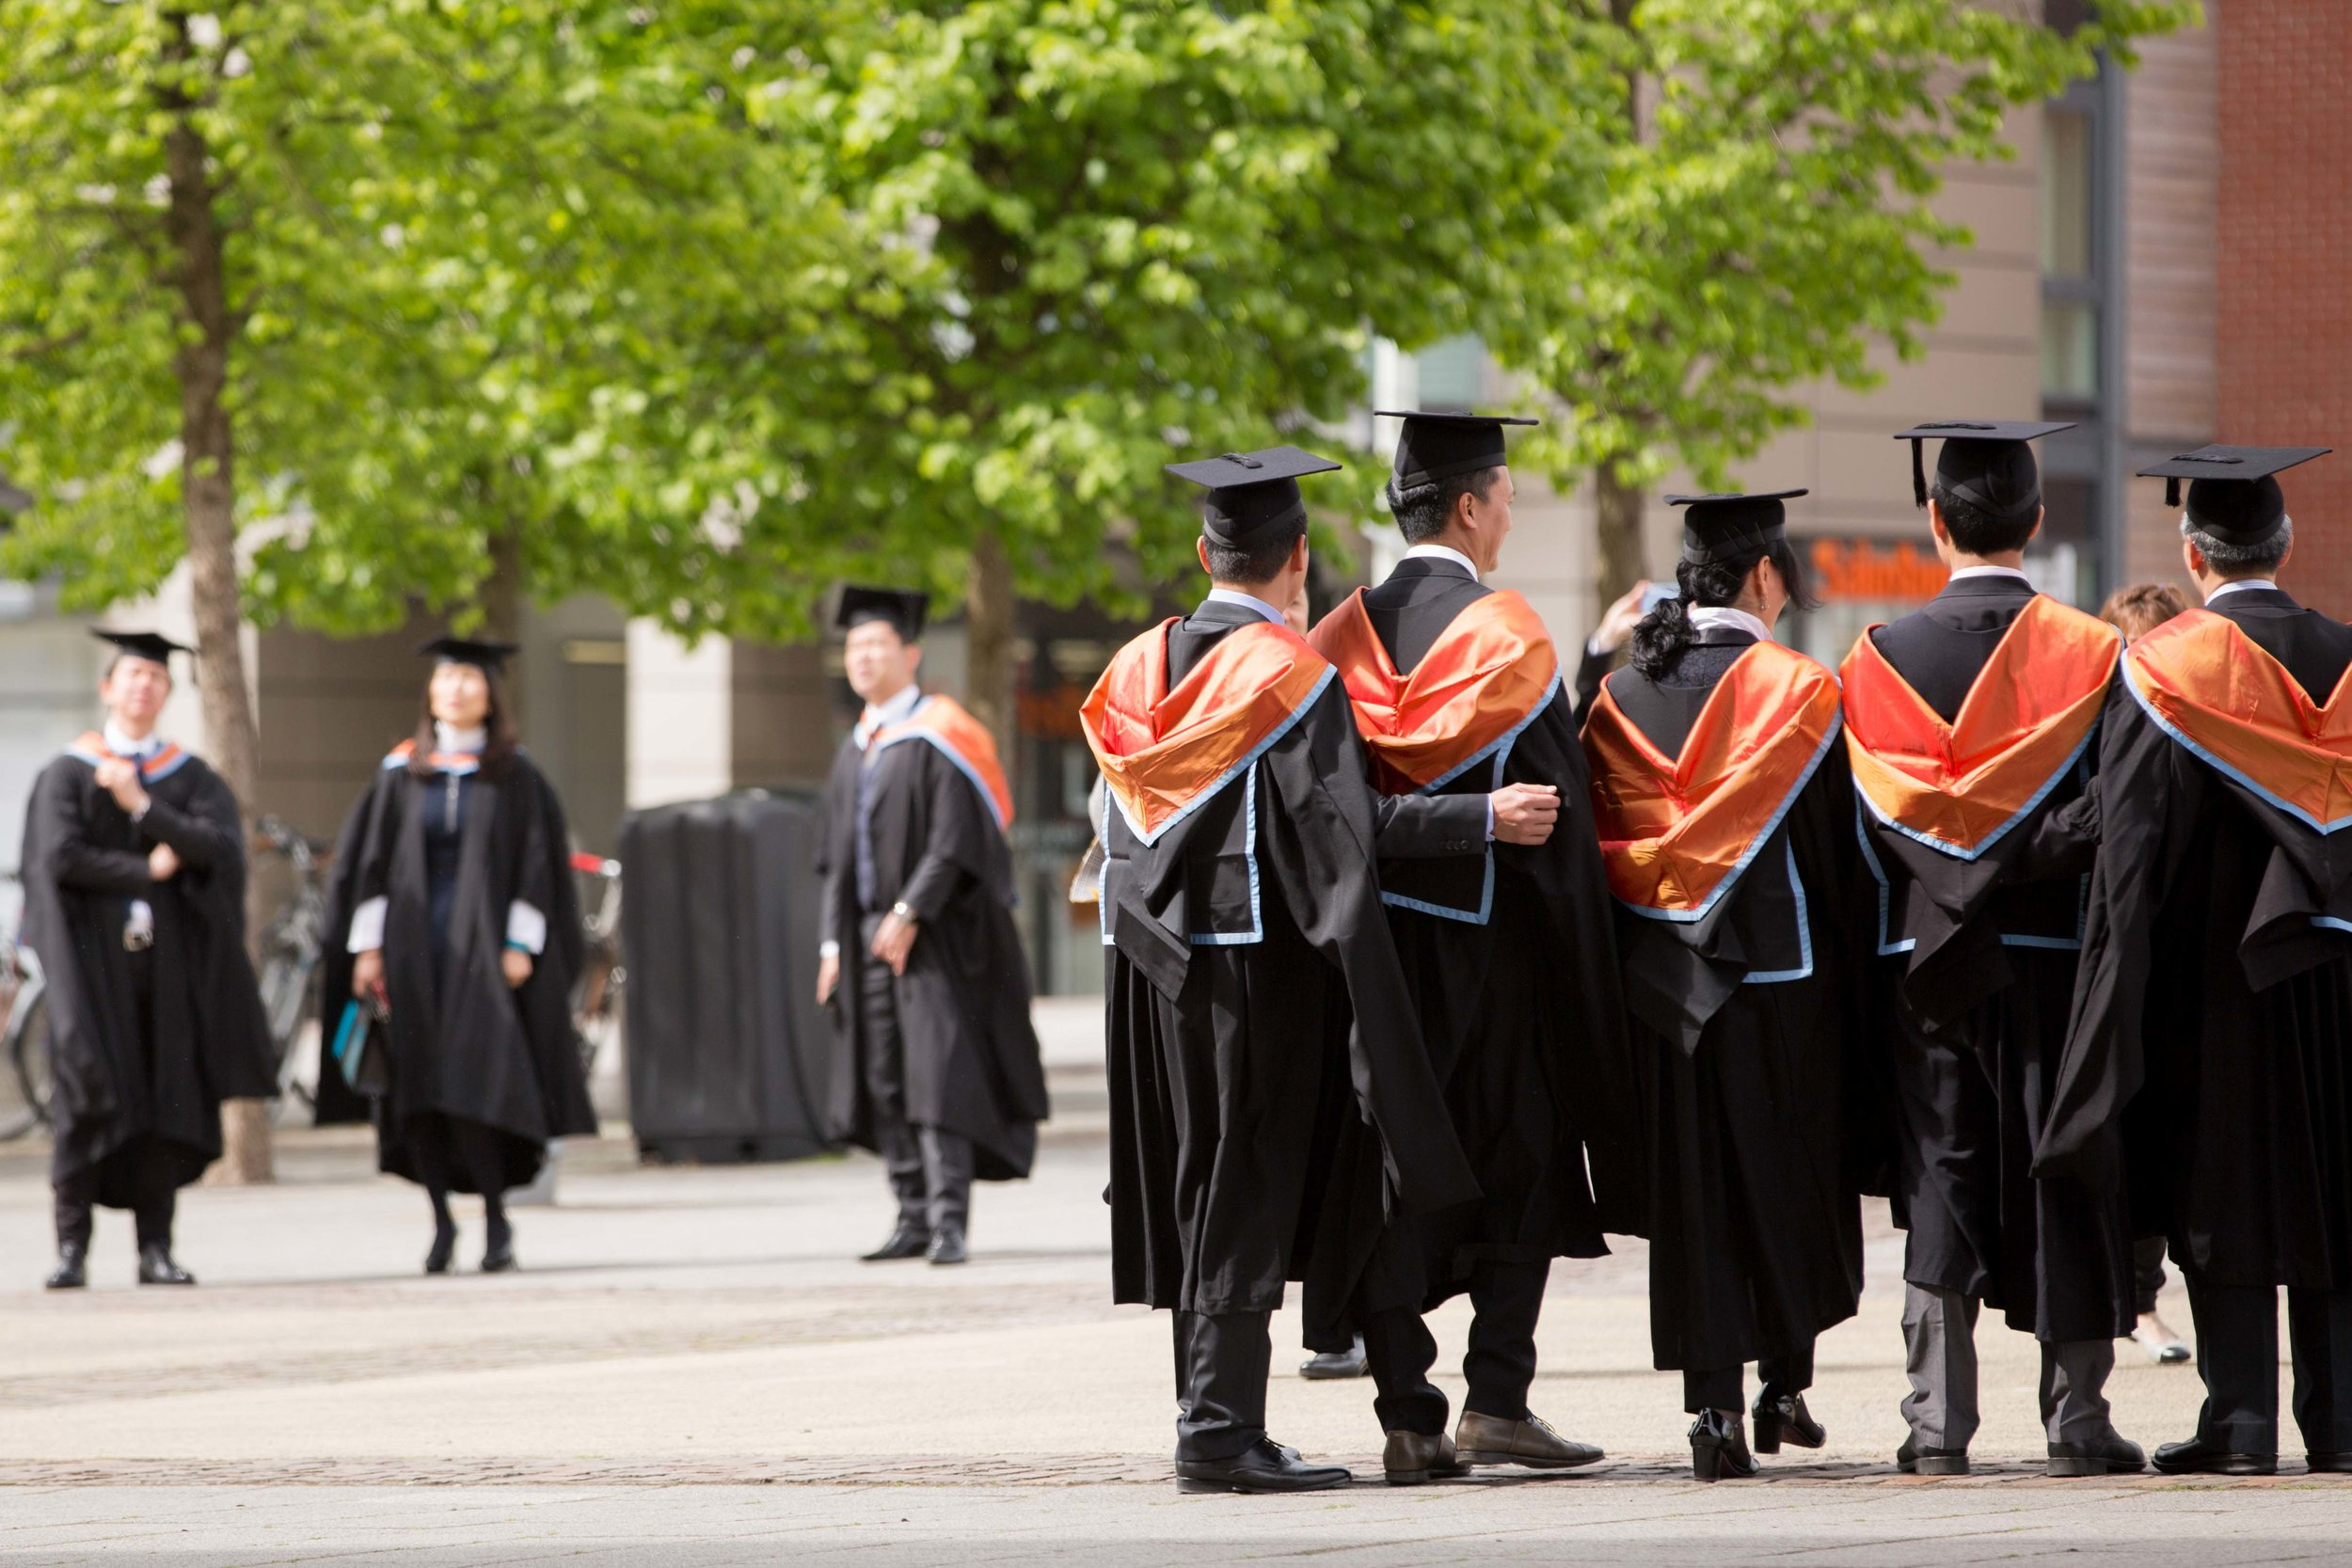 Arden-university-graduation-commercial-photographer-cardiff-natalia-smith-photography-21.jpg